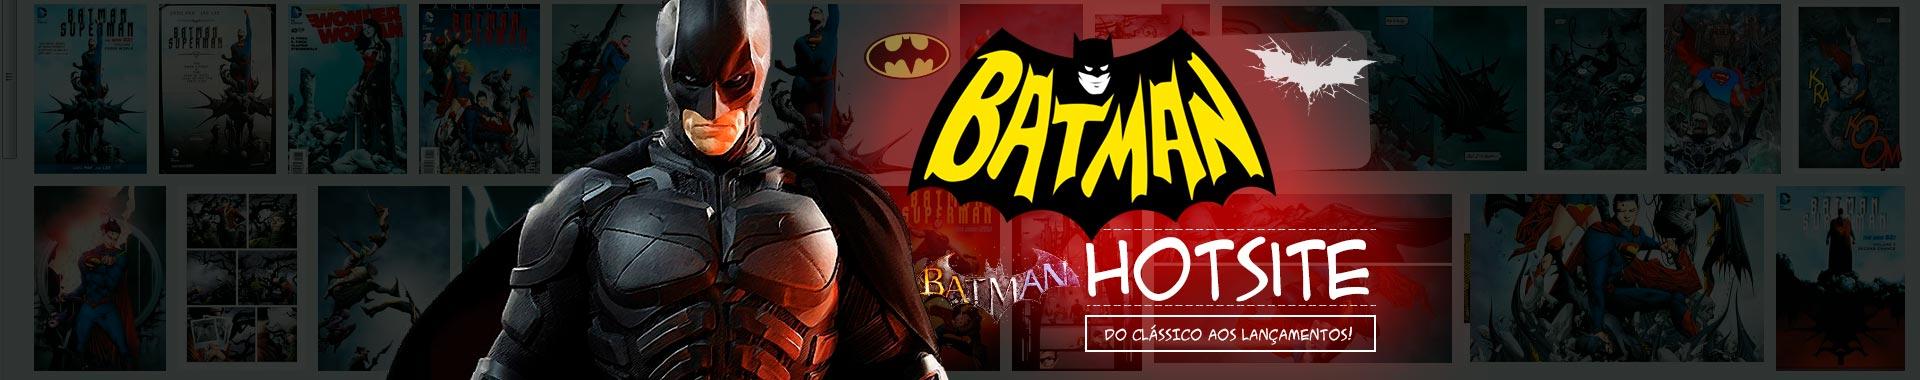 Hotsite Batman